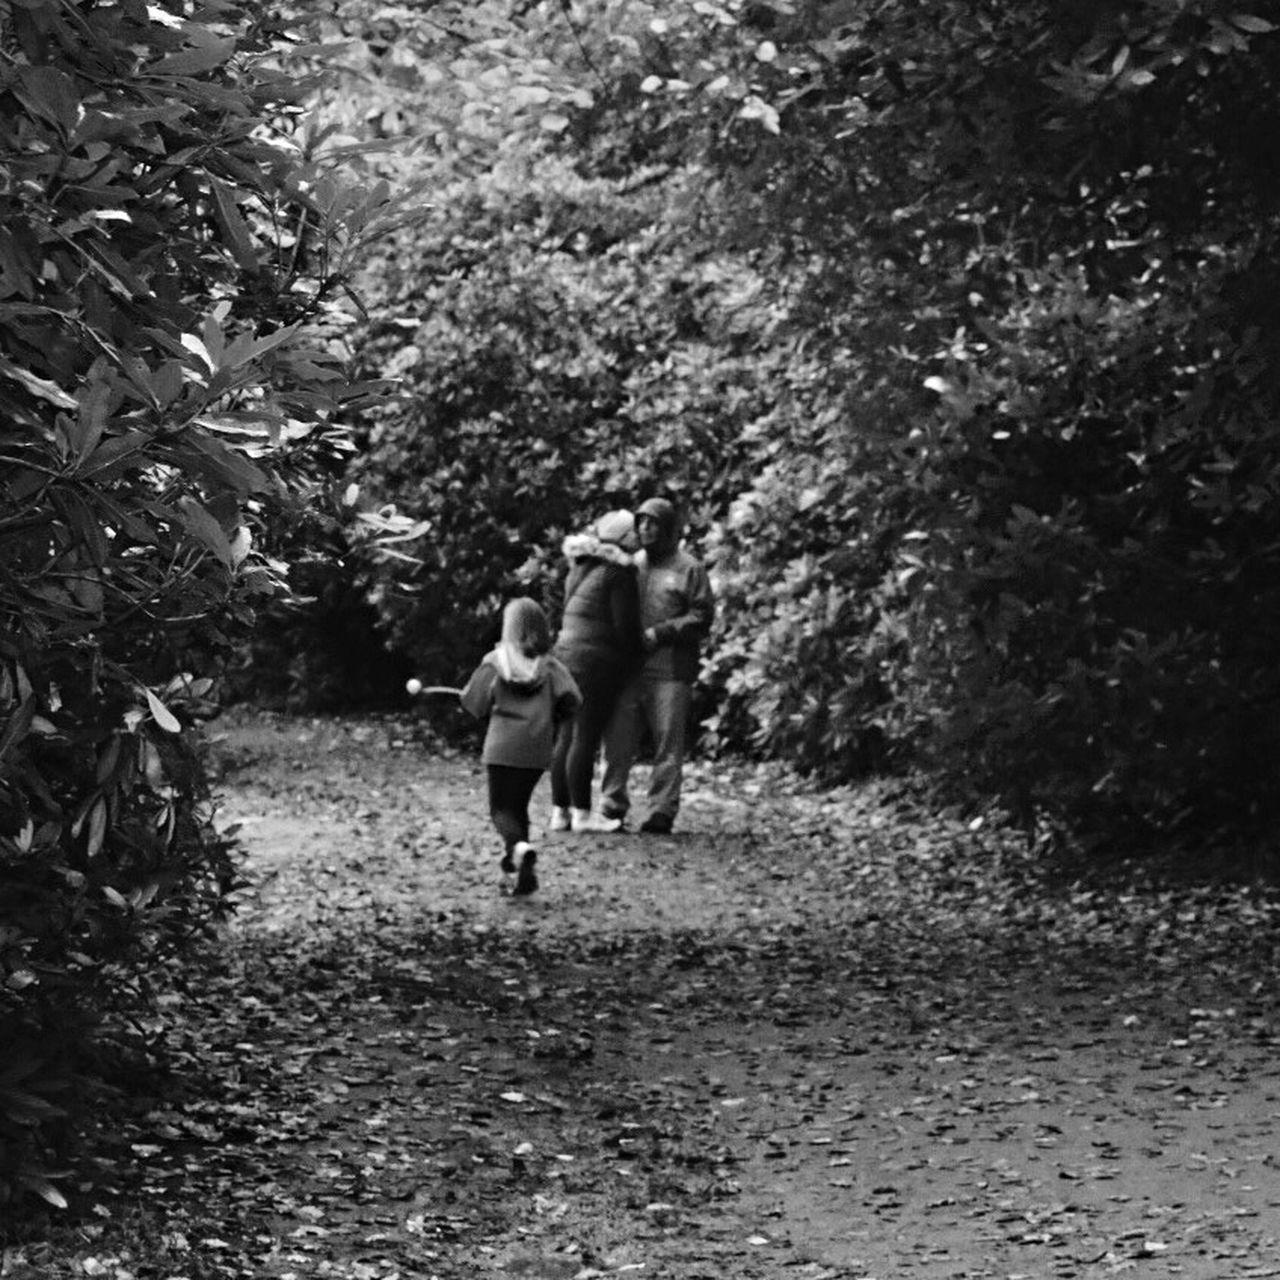 Wollaton Hall Enjoying Life Showcase: November The Following Enjoying Nature Walking Around